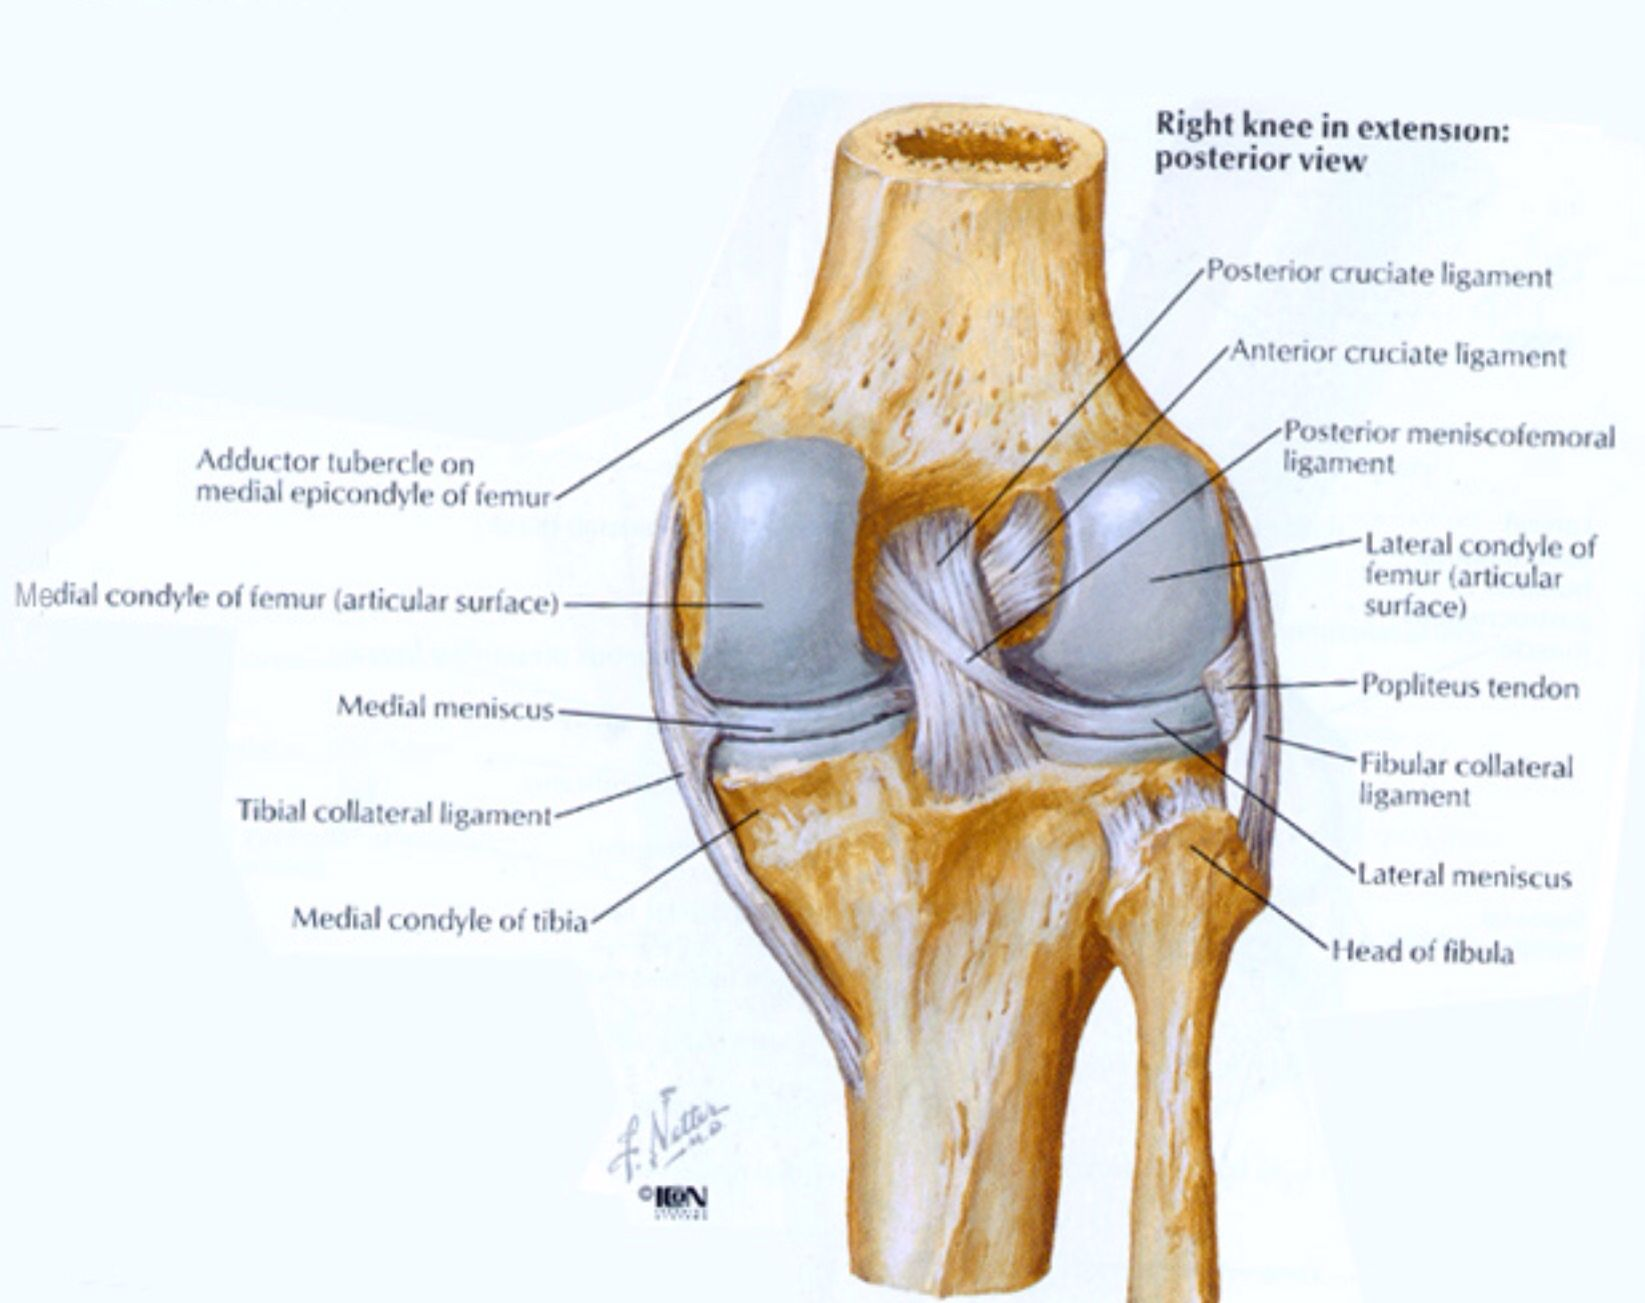 anatomical heart diagram posterior 2003 ford taurus radio wiring view of the knee anatomy pinterest